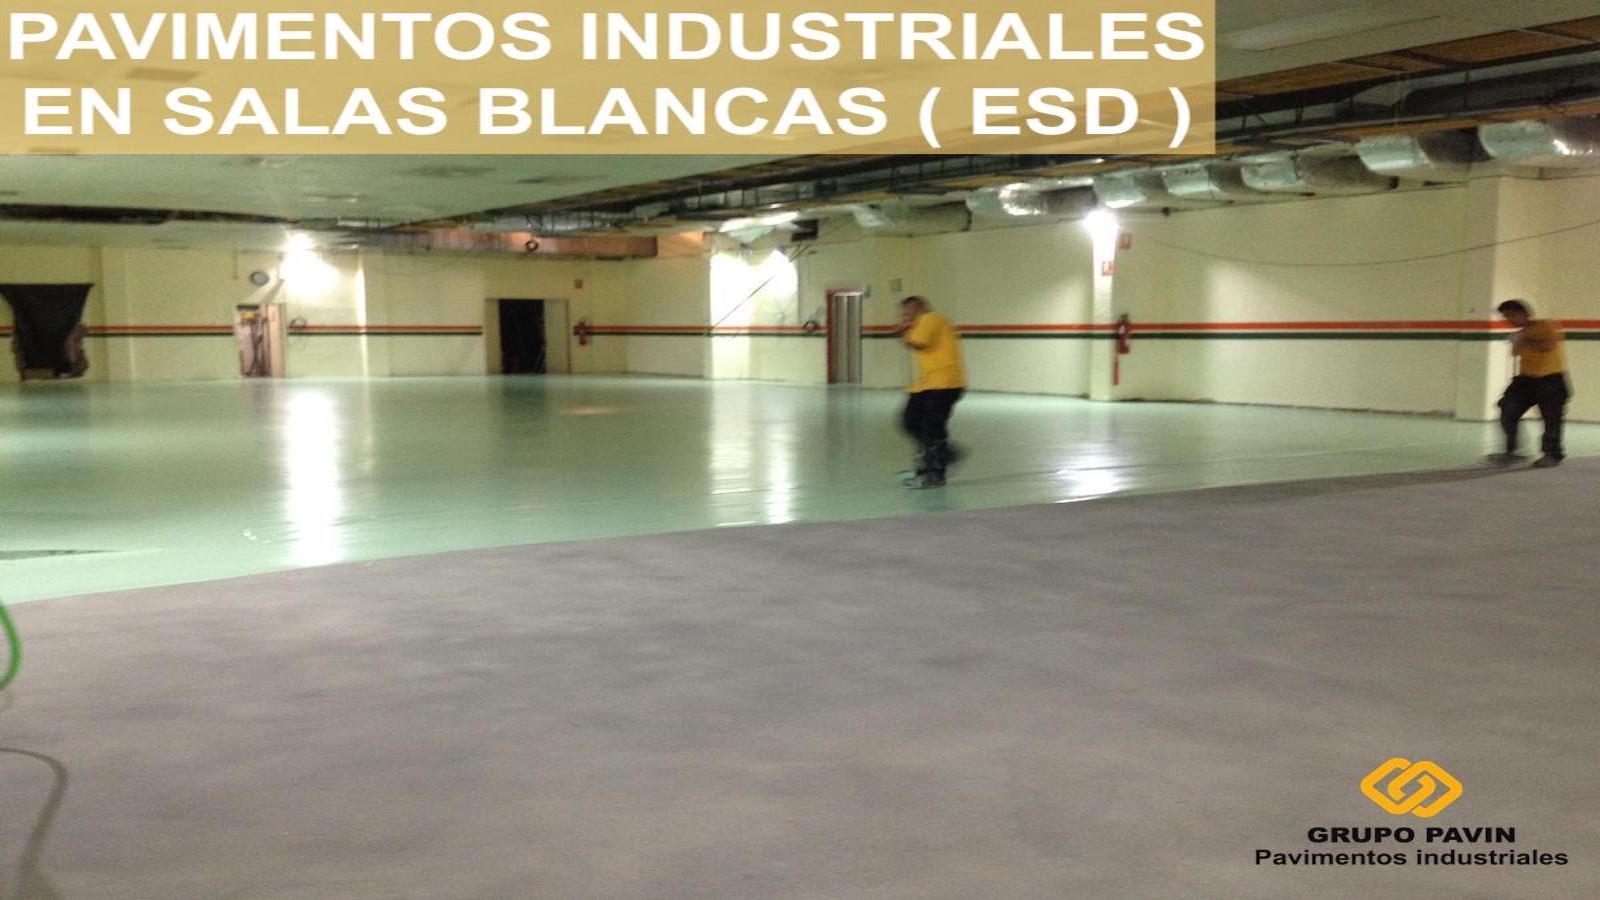 Pavimentos industriales para salas blancas ( ESD )